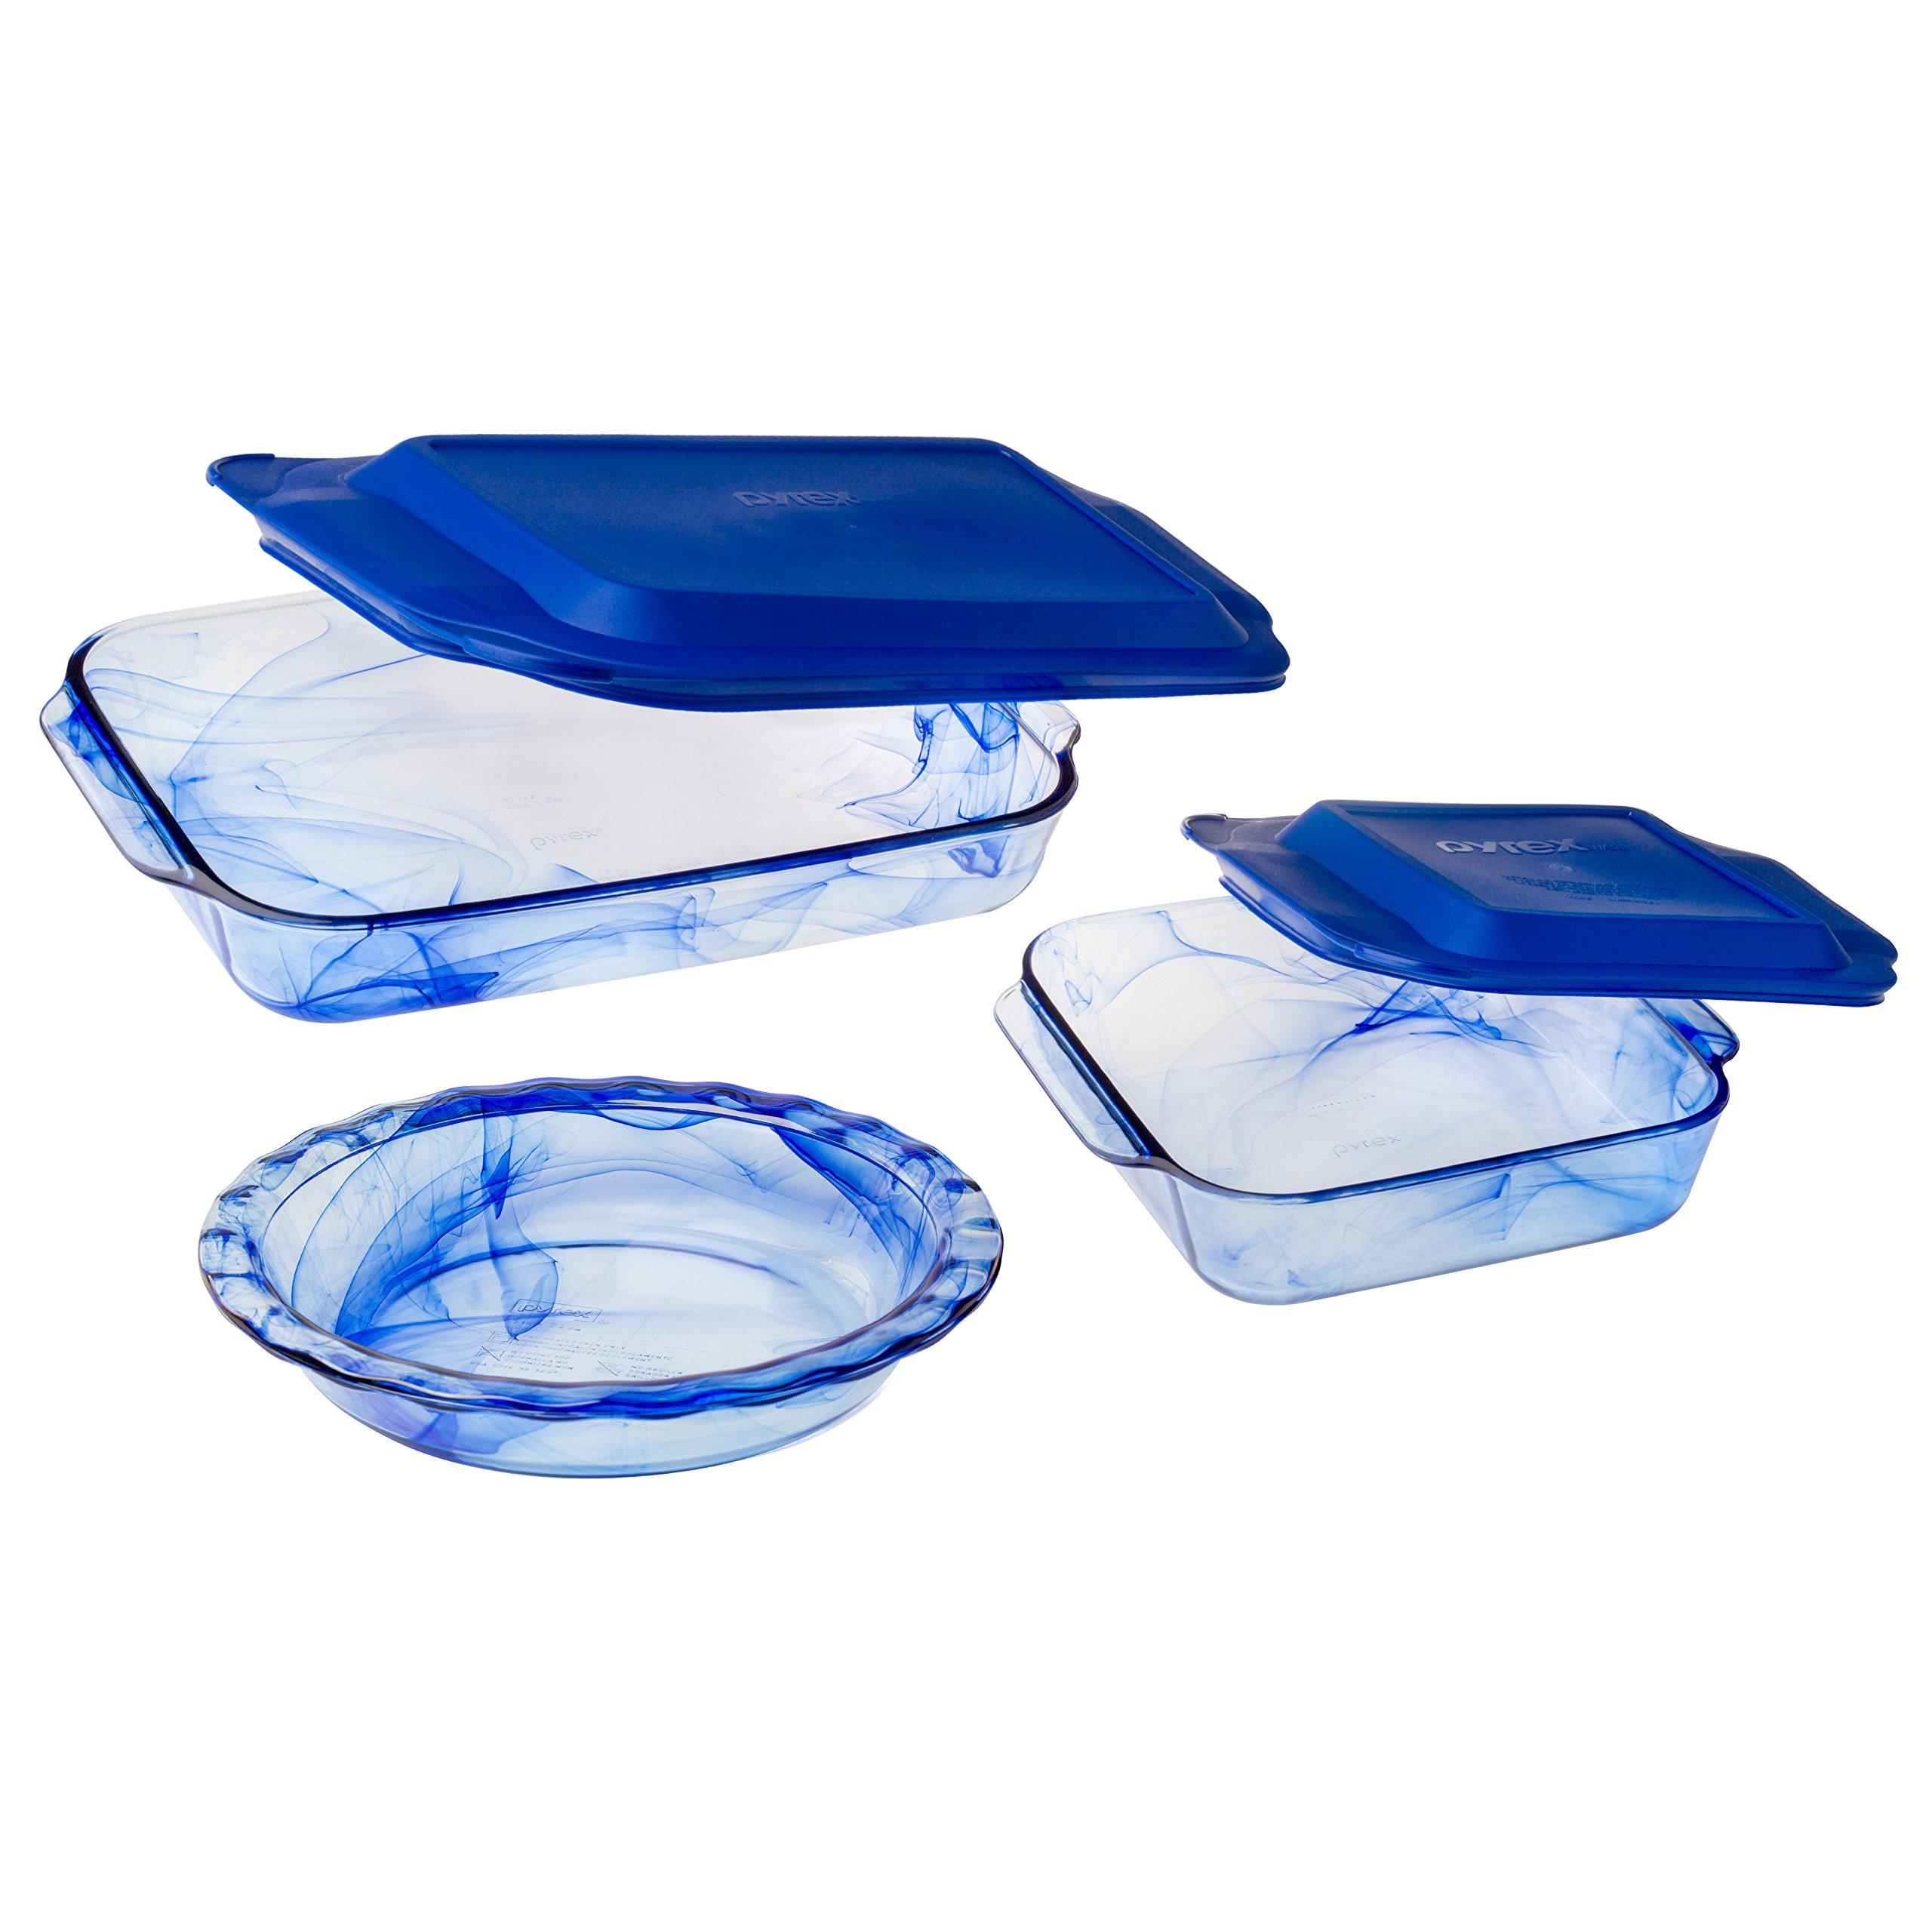 Pyrex 1127972 5 Piece Watercolor Collection Bakeware Set, Blue Lagoon by Pyrex